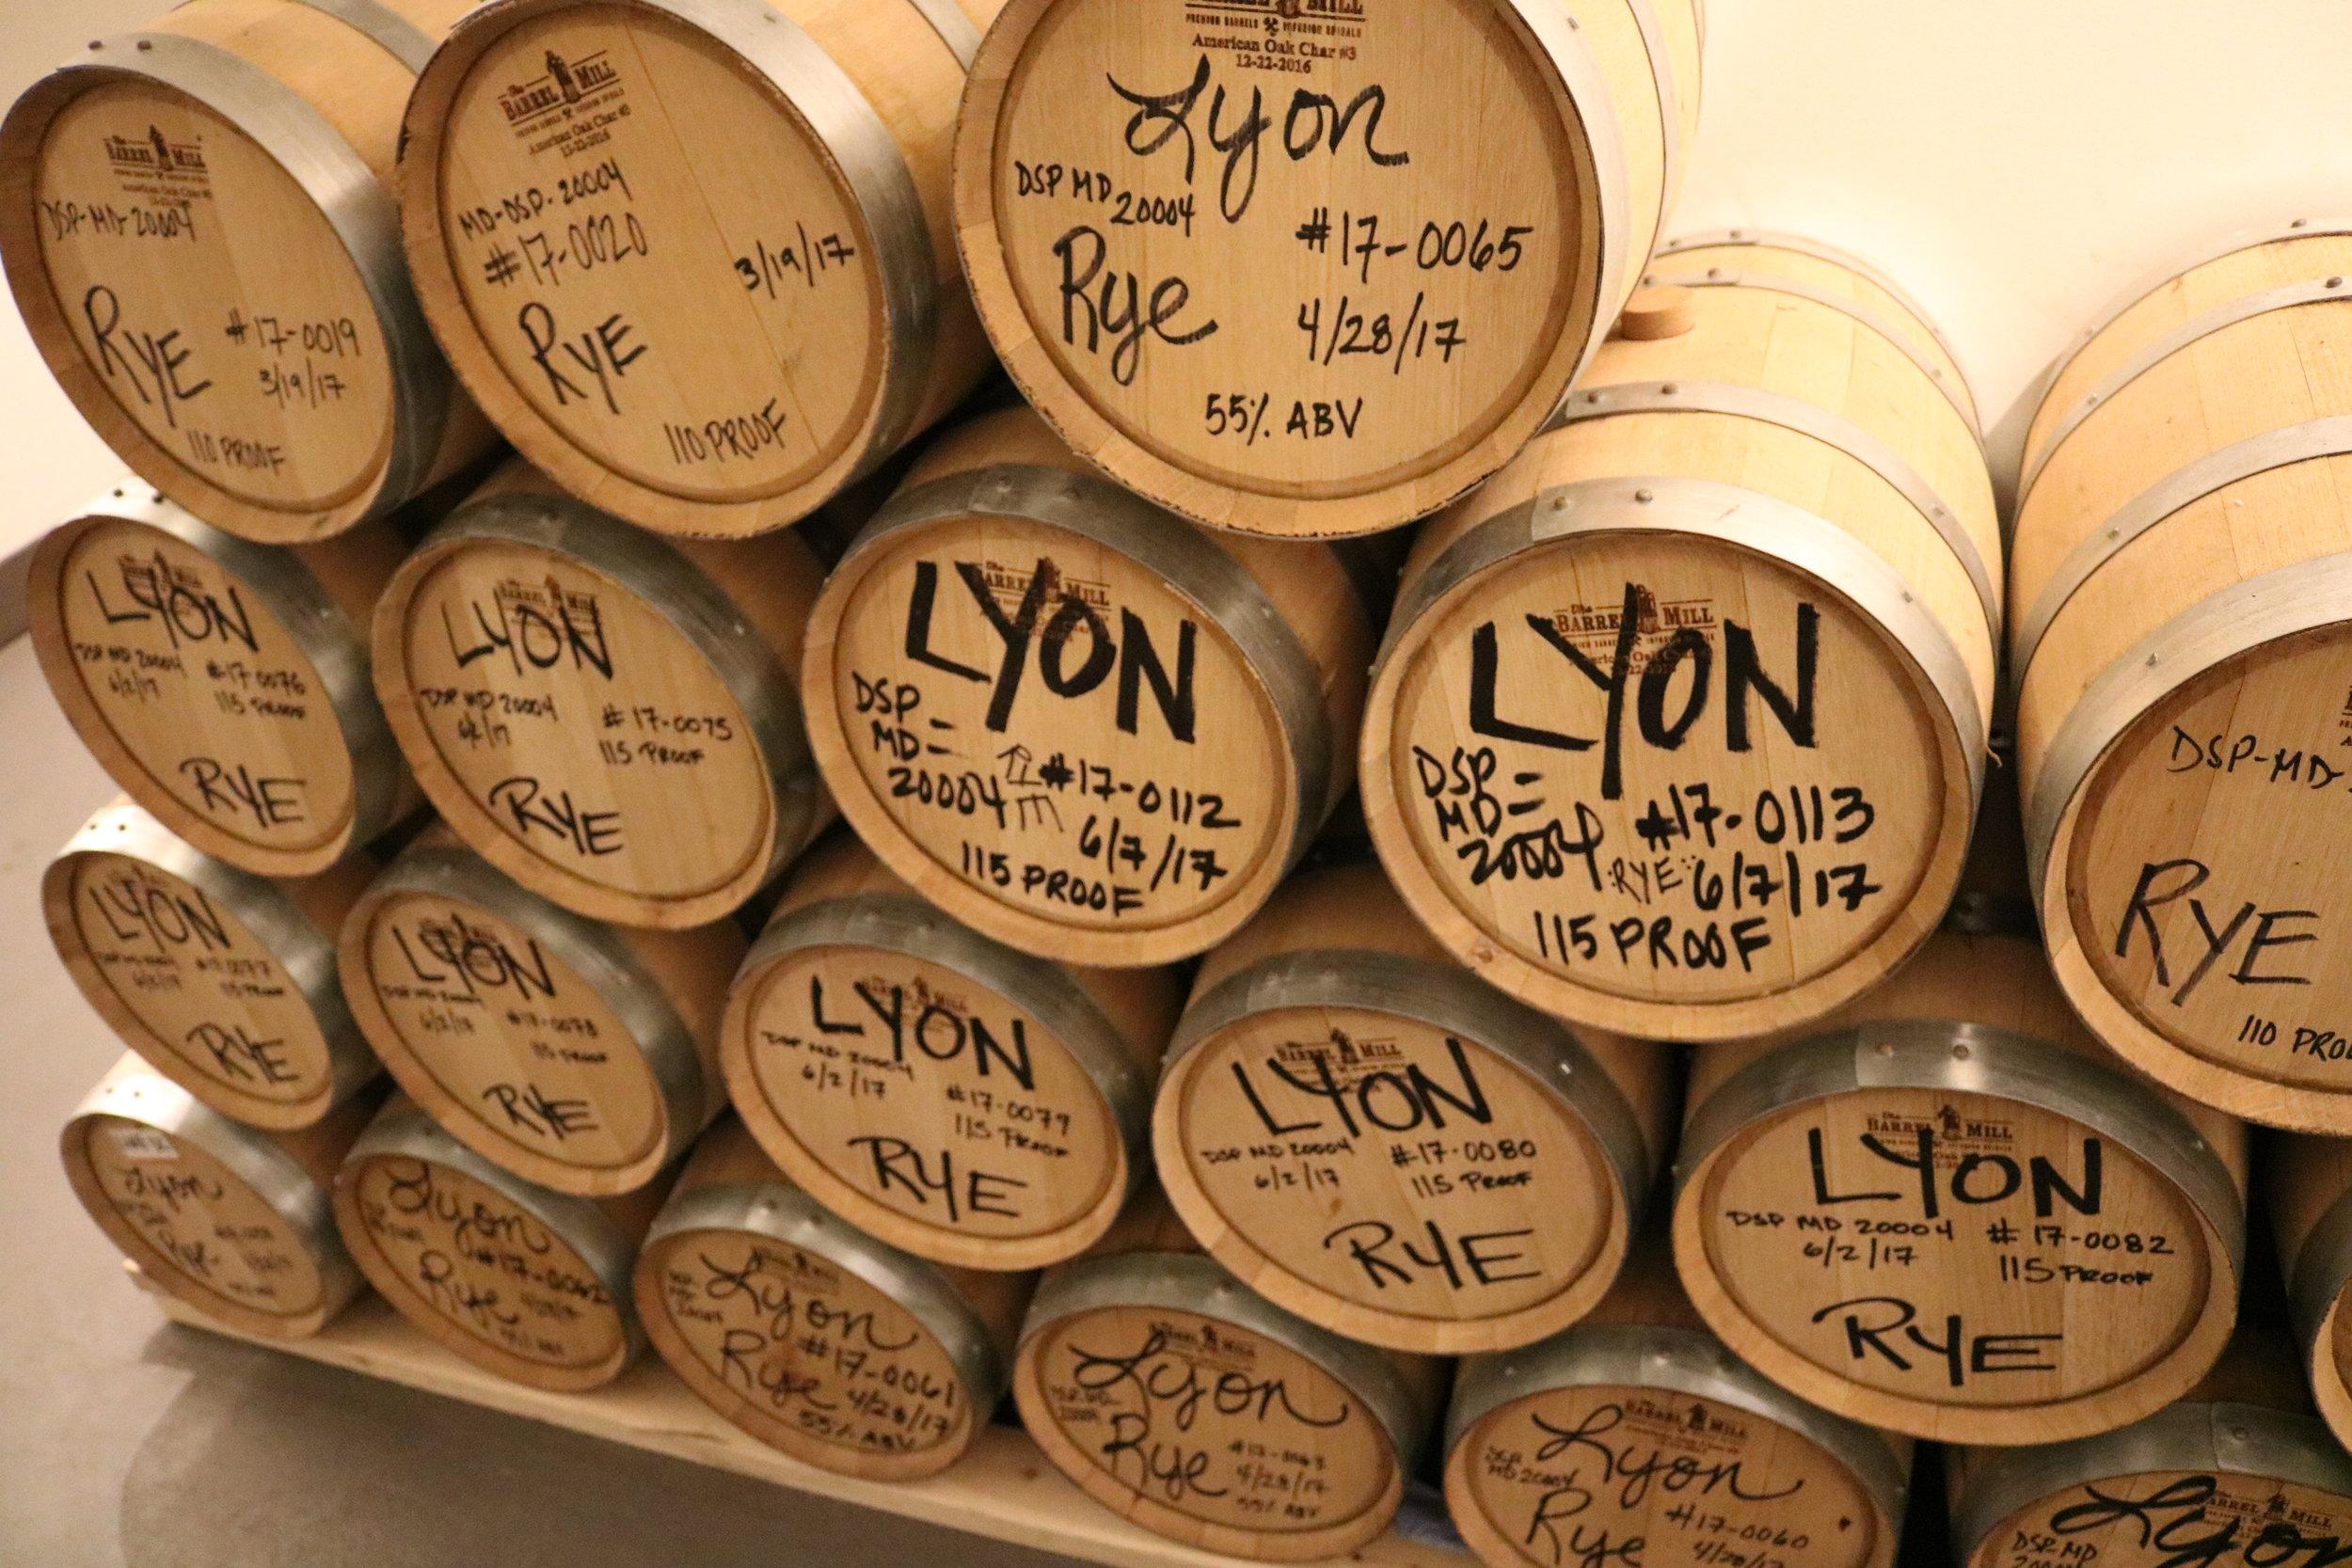 Lyon Rum Barrels.JPG